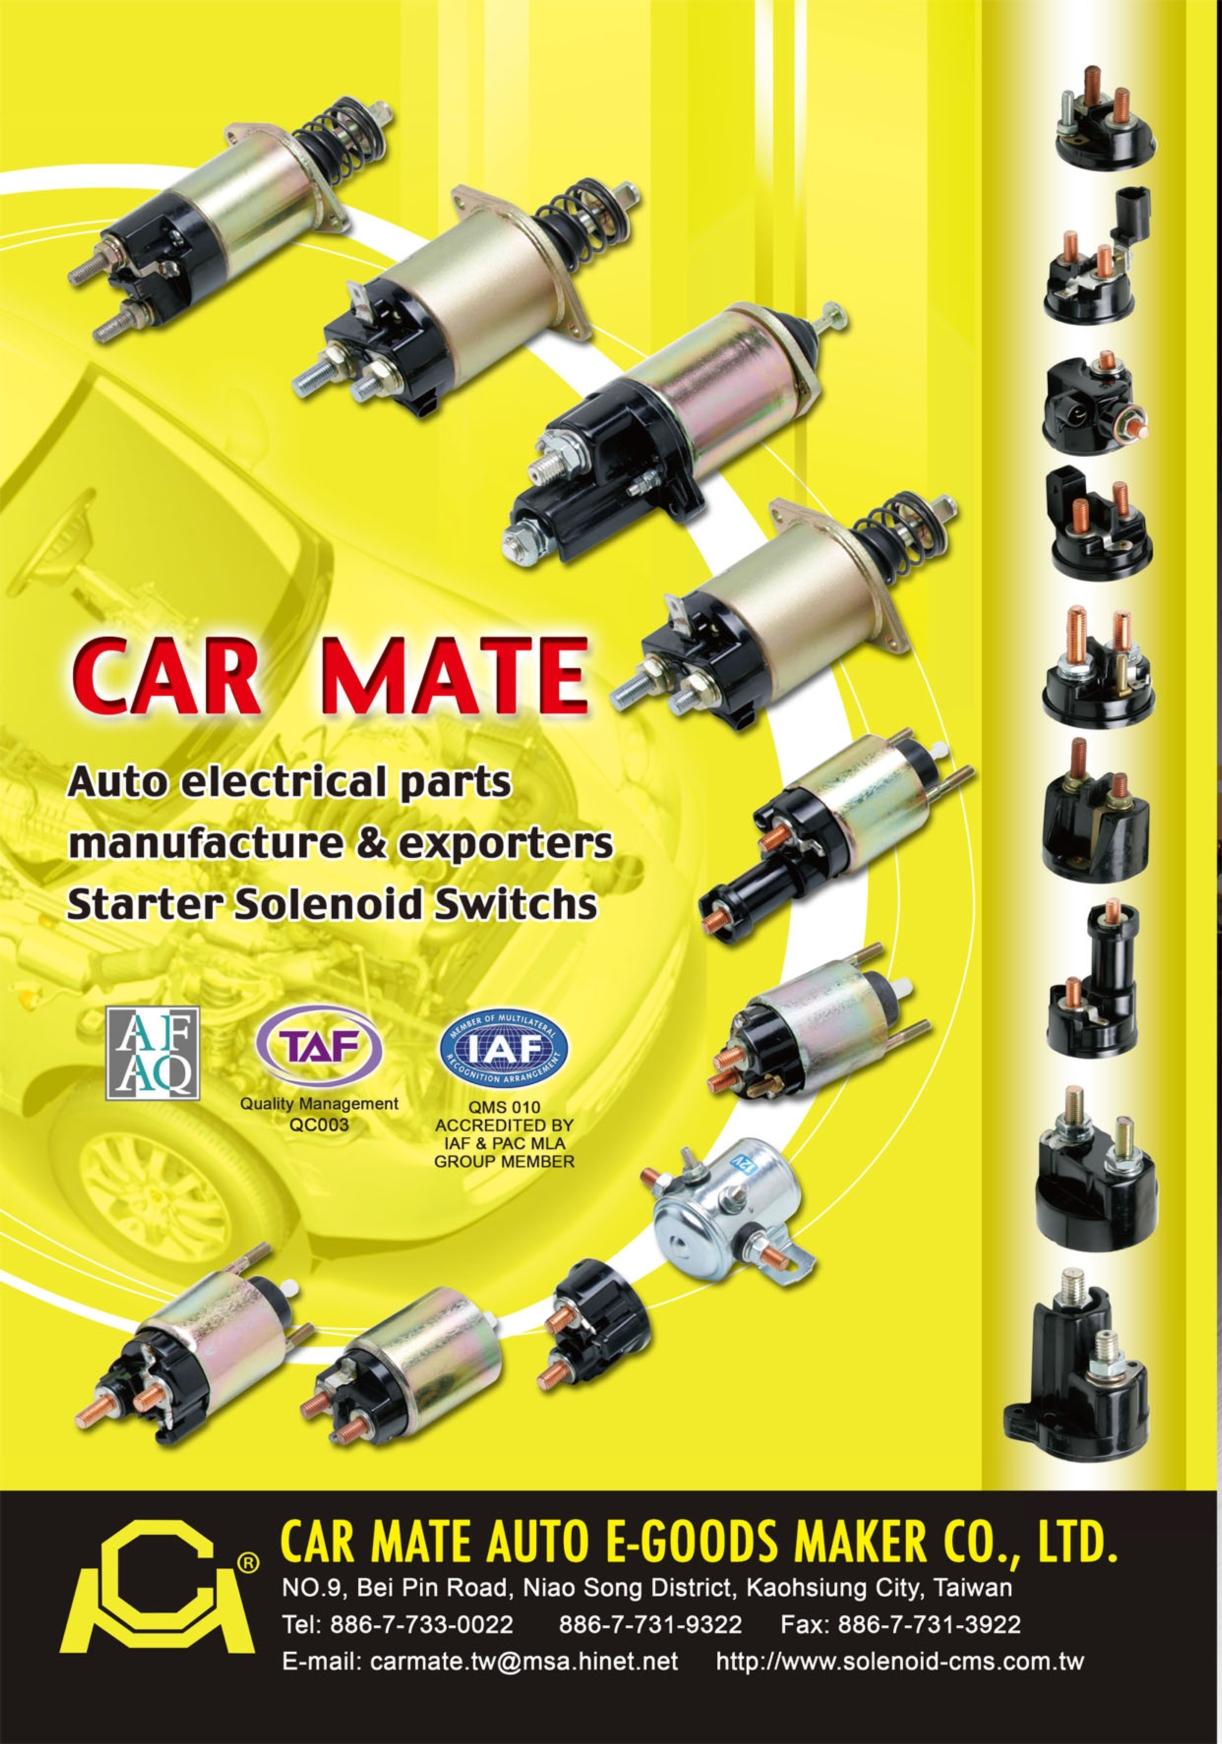 TTG-Taiwan Transportation Equipment Guide CAR MATE AUTO E-GOODS MAKER CO., LTD.